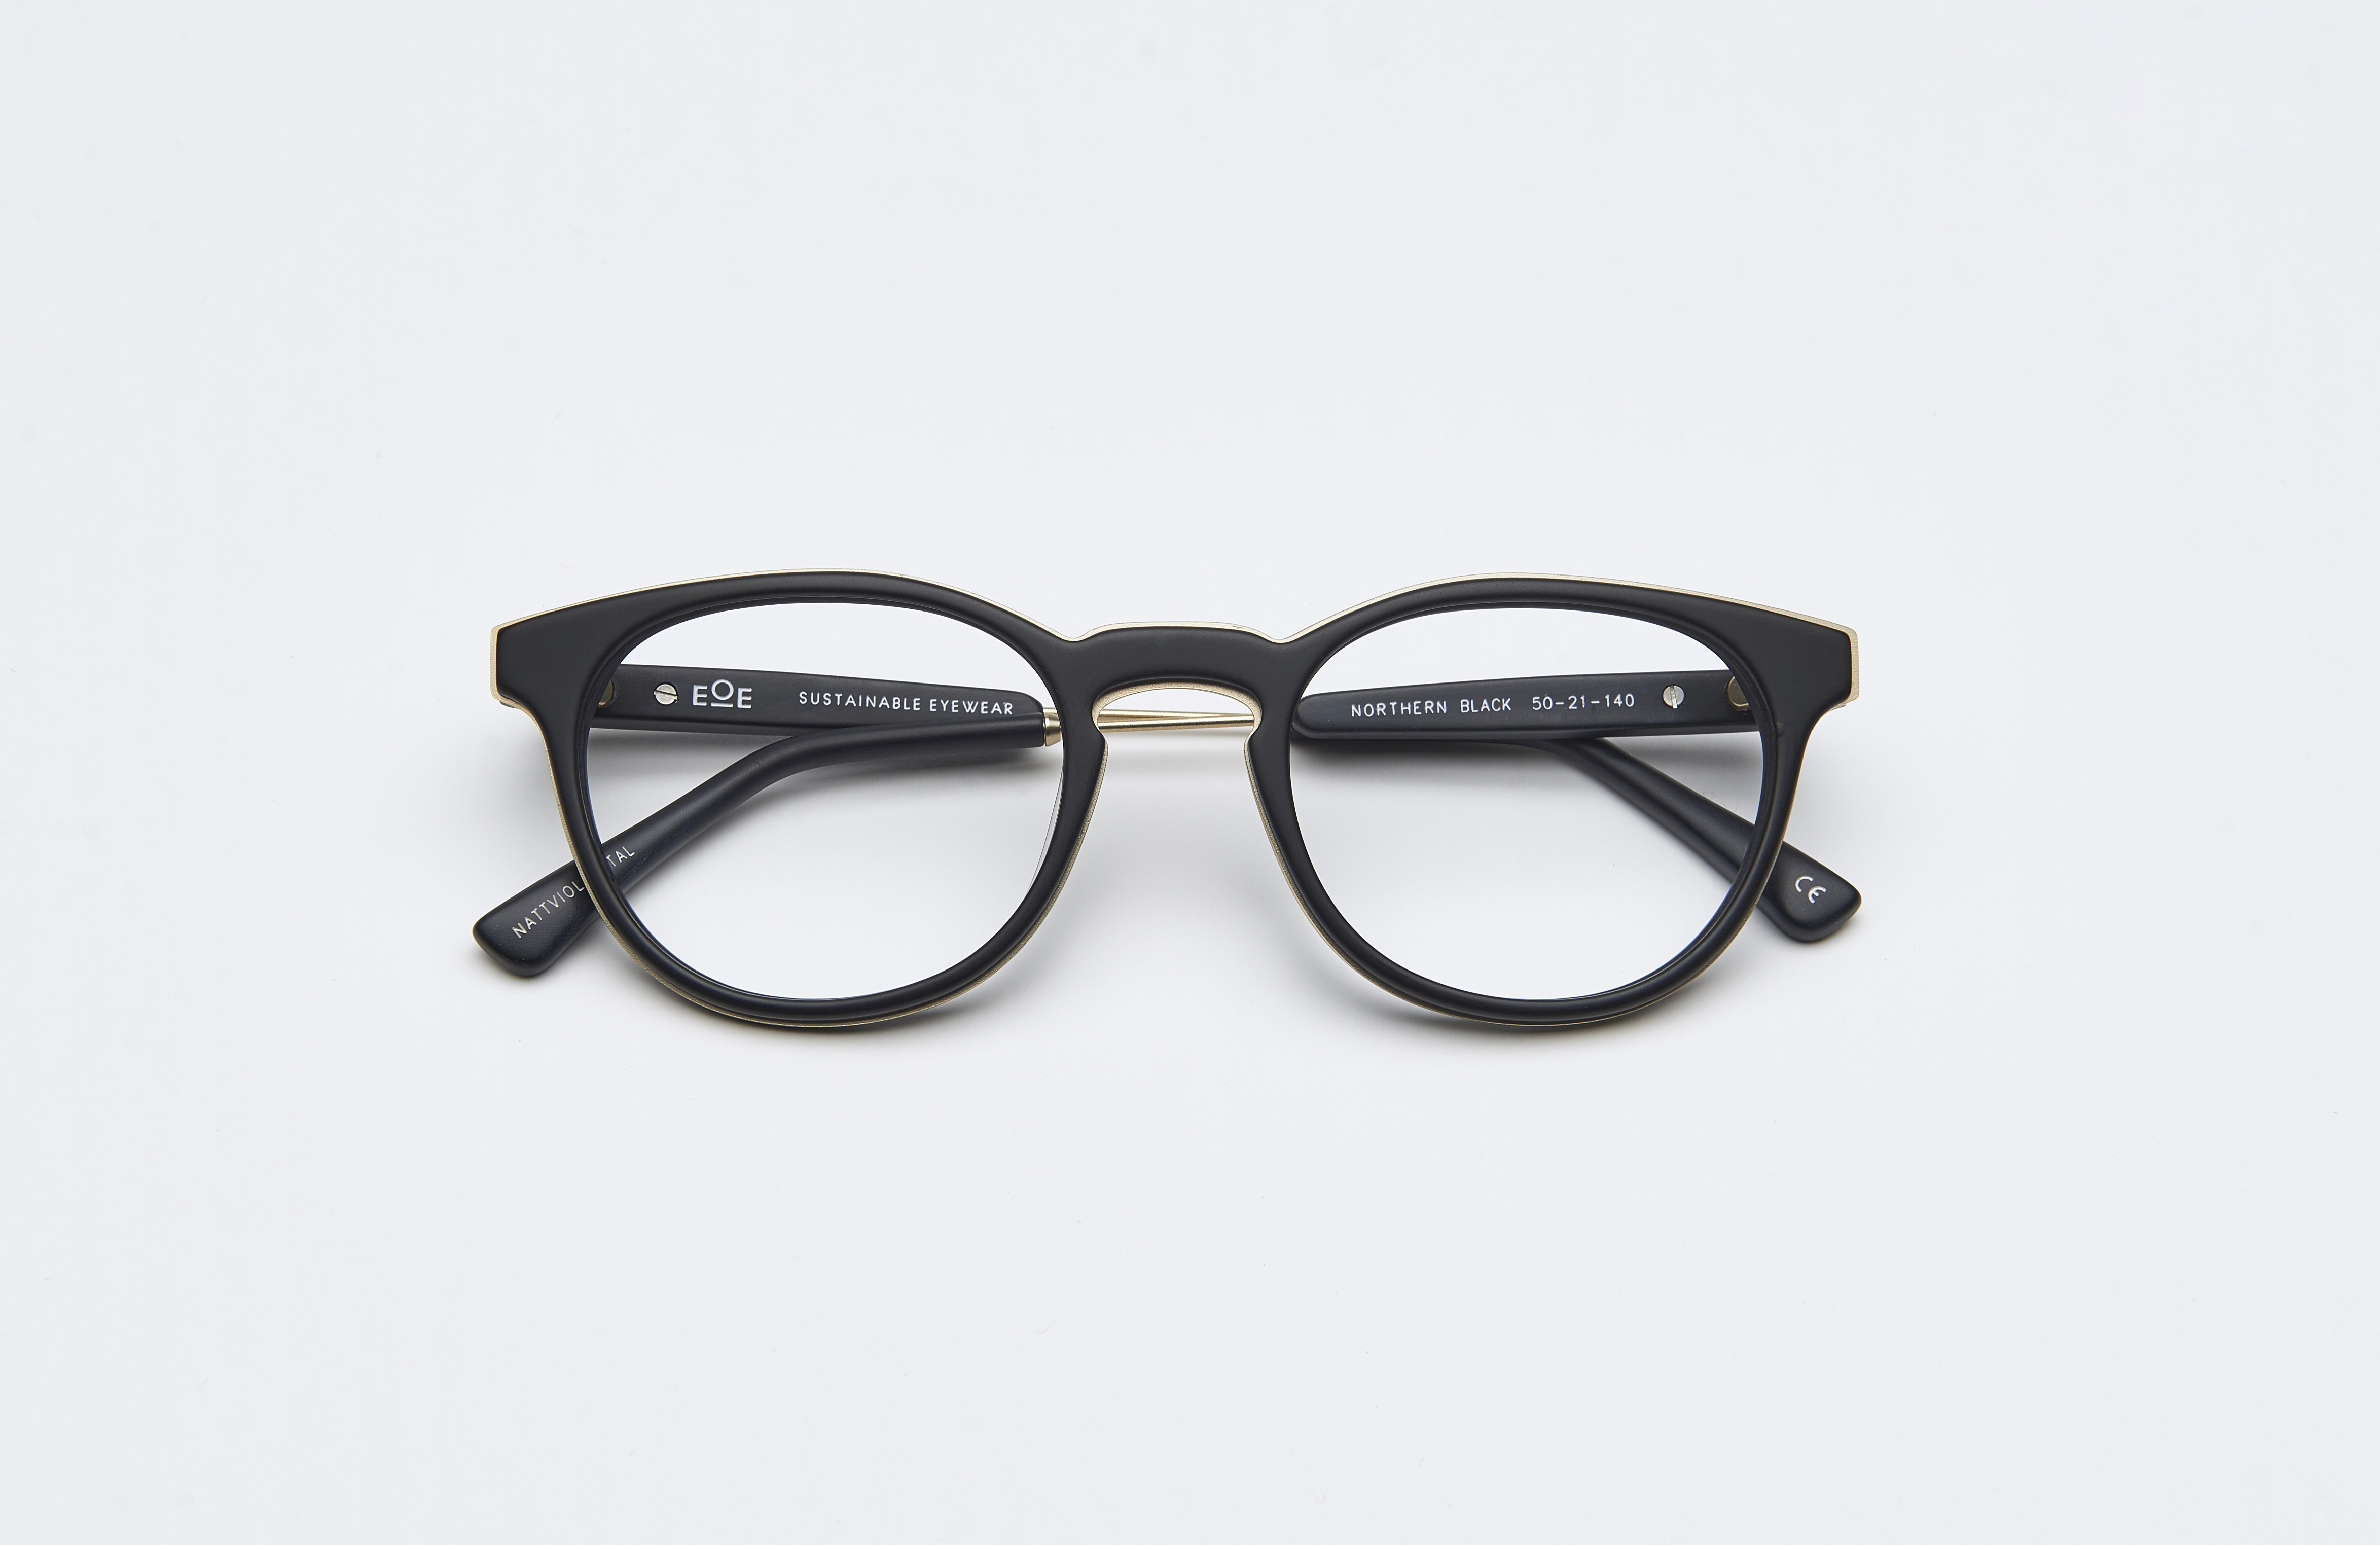 dcf74197bc4c NATTVIOL METAL 50 Northern Black Matte - EOE Eyewear